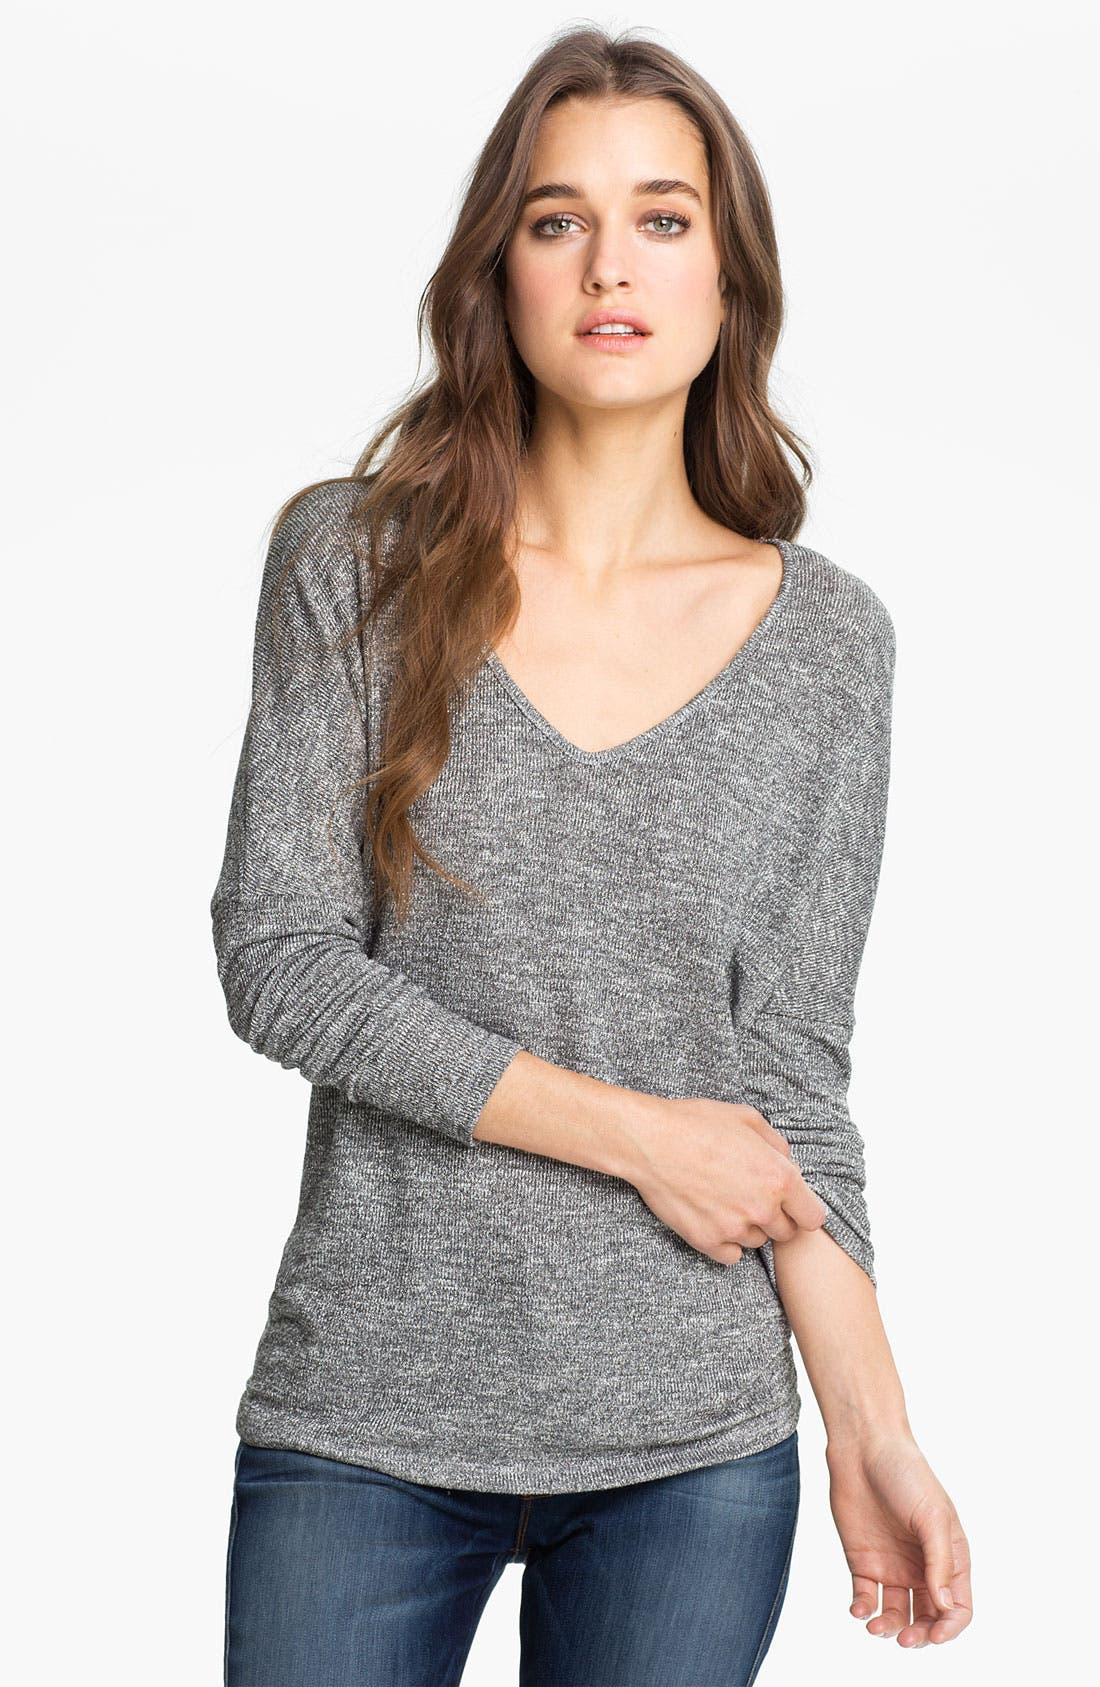 Alternate Image 1 Selected - Velvet Oversized Metallic Sweater (Nordstrom Exclusive)